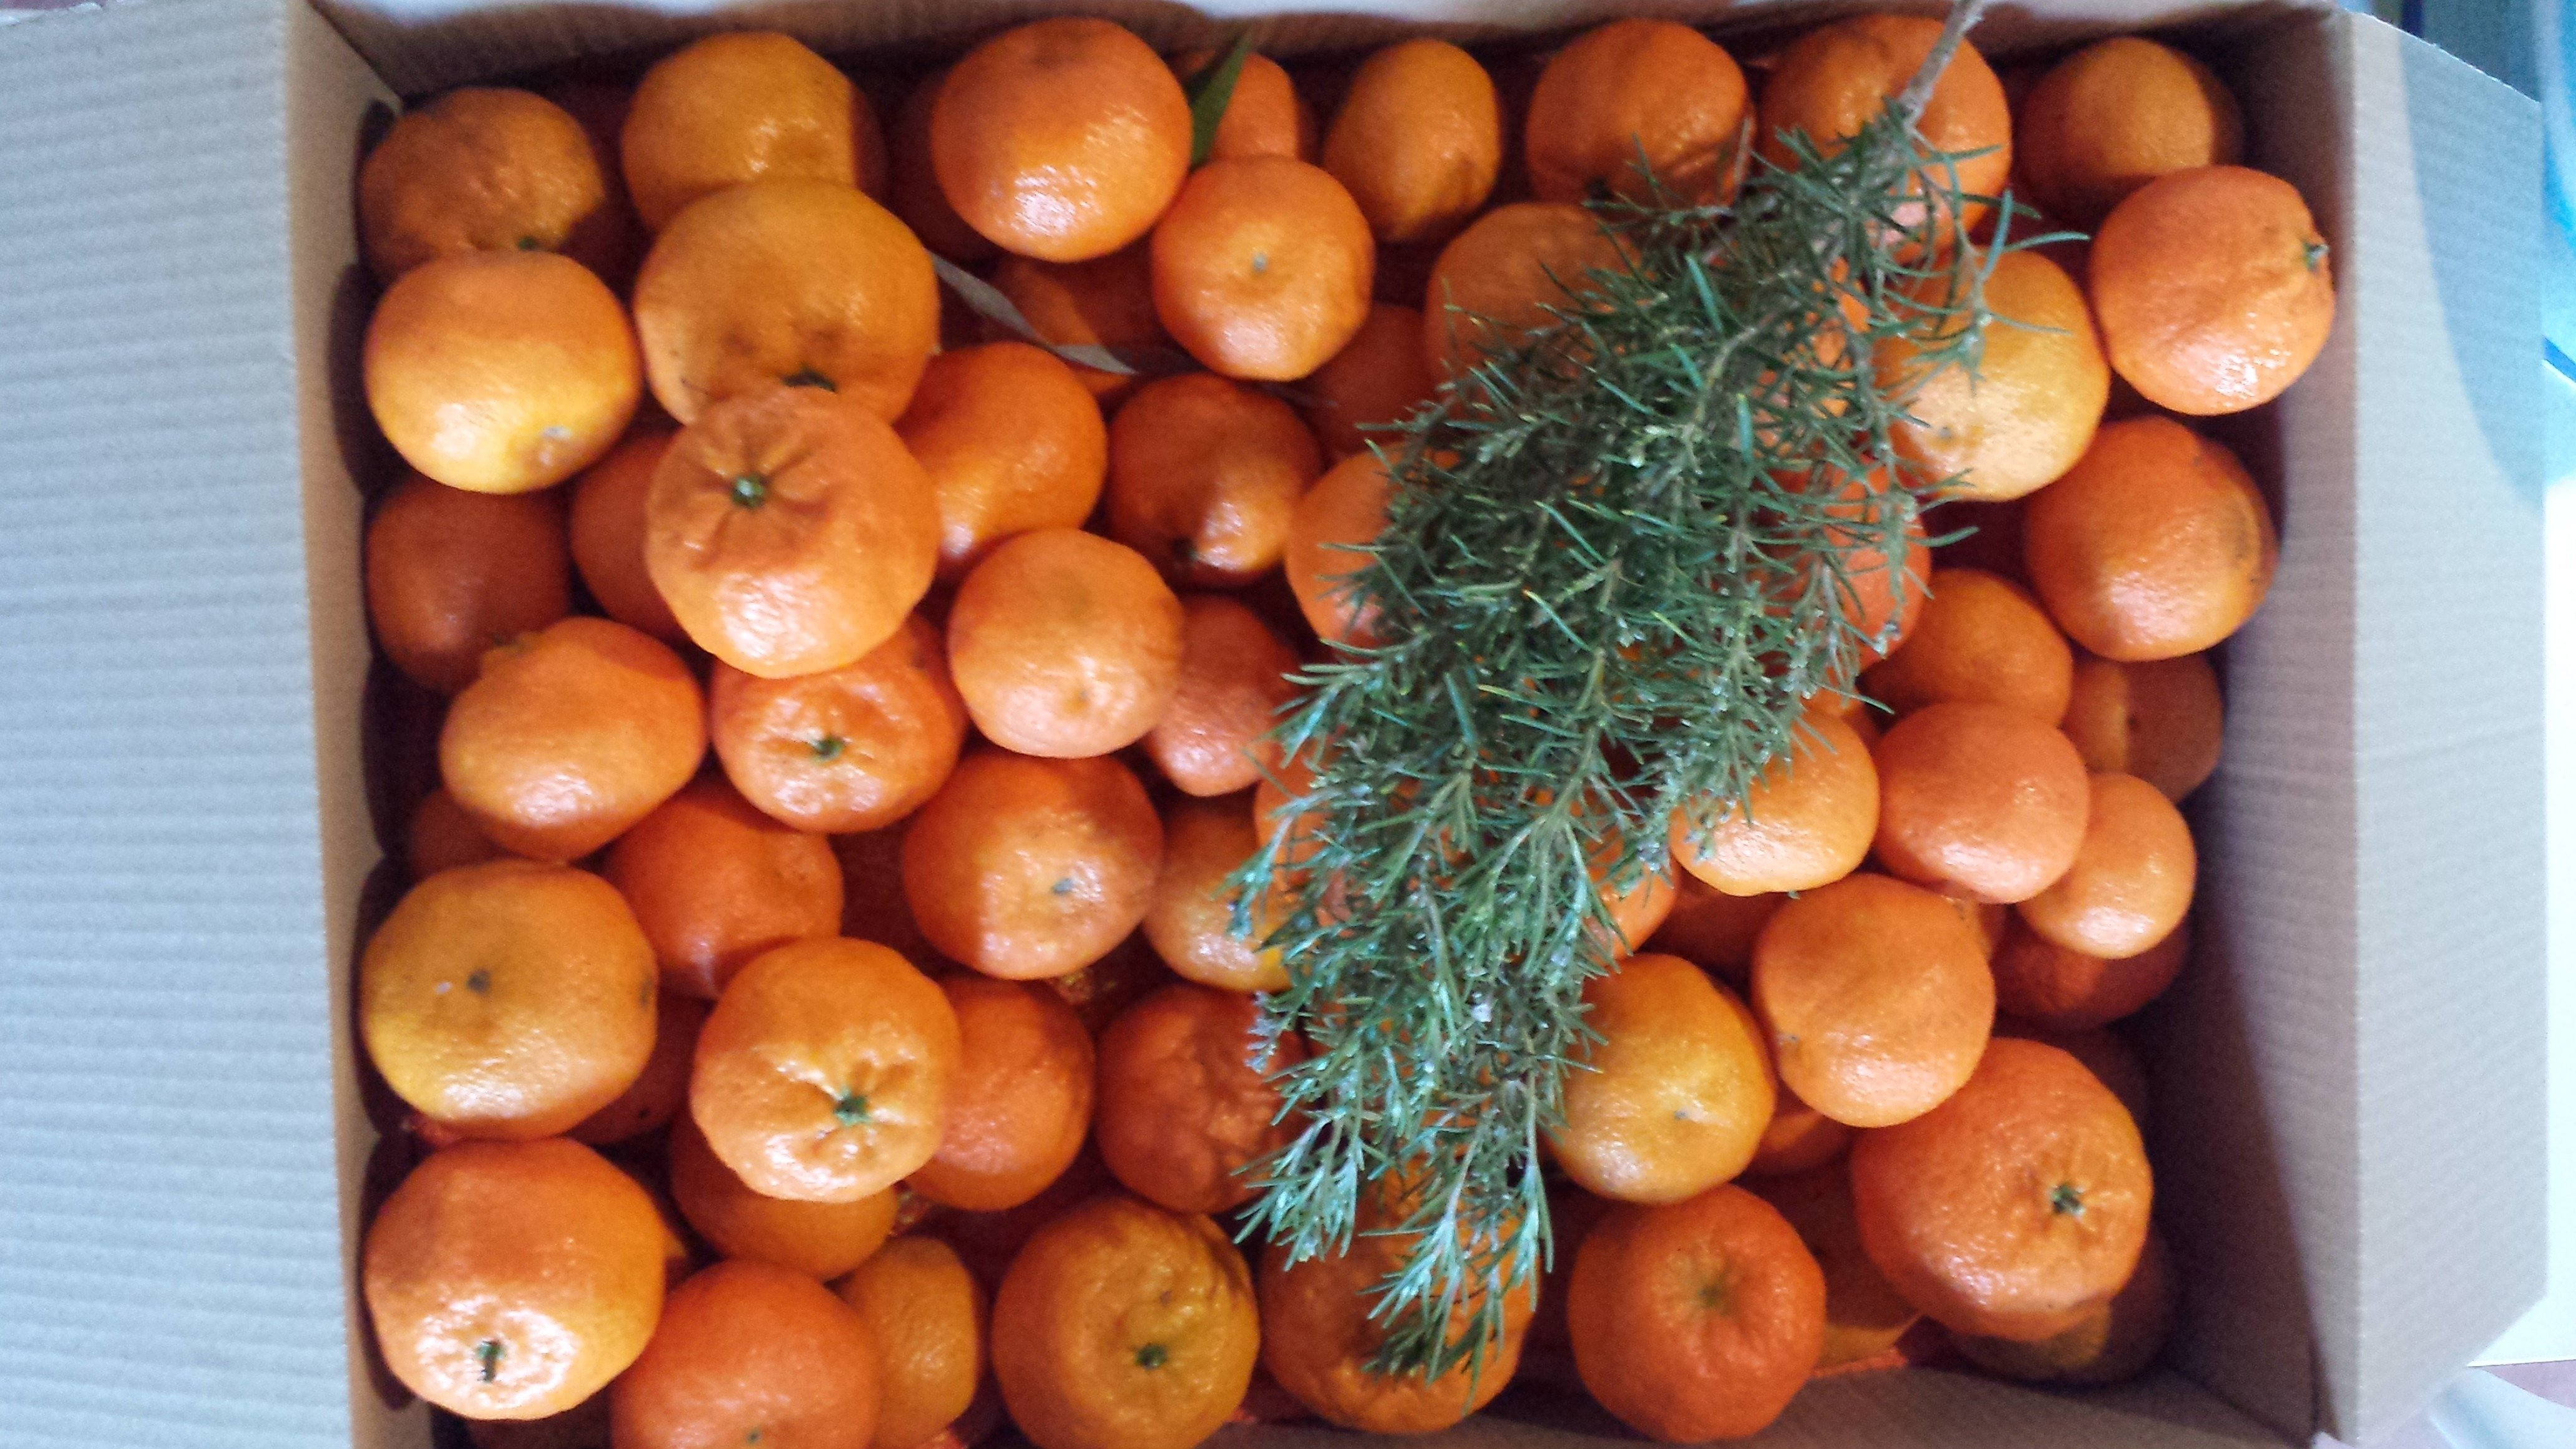 caja de clementinas2 - Cajas de clementinas Ibiza